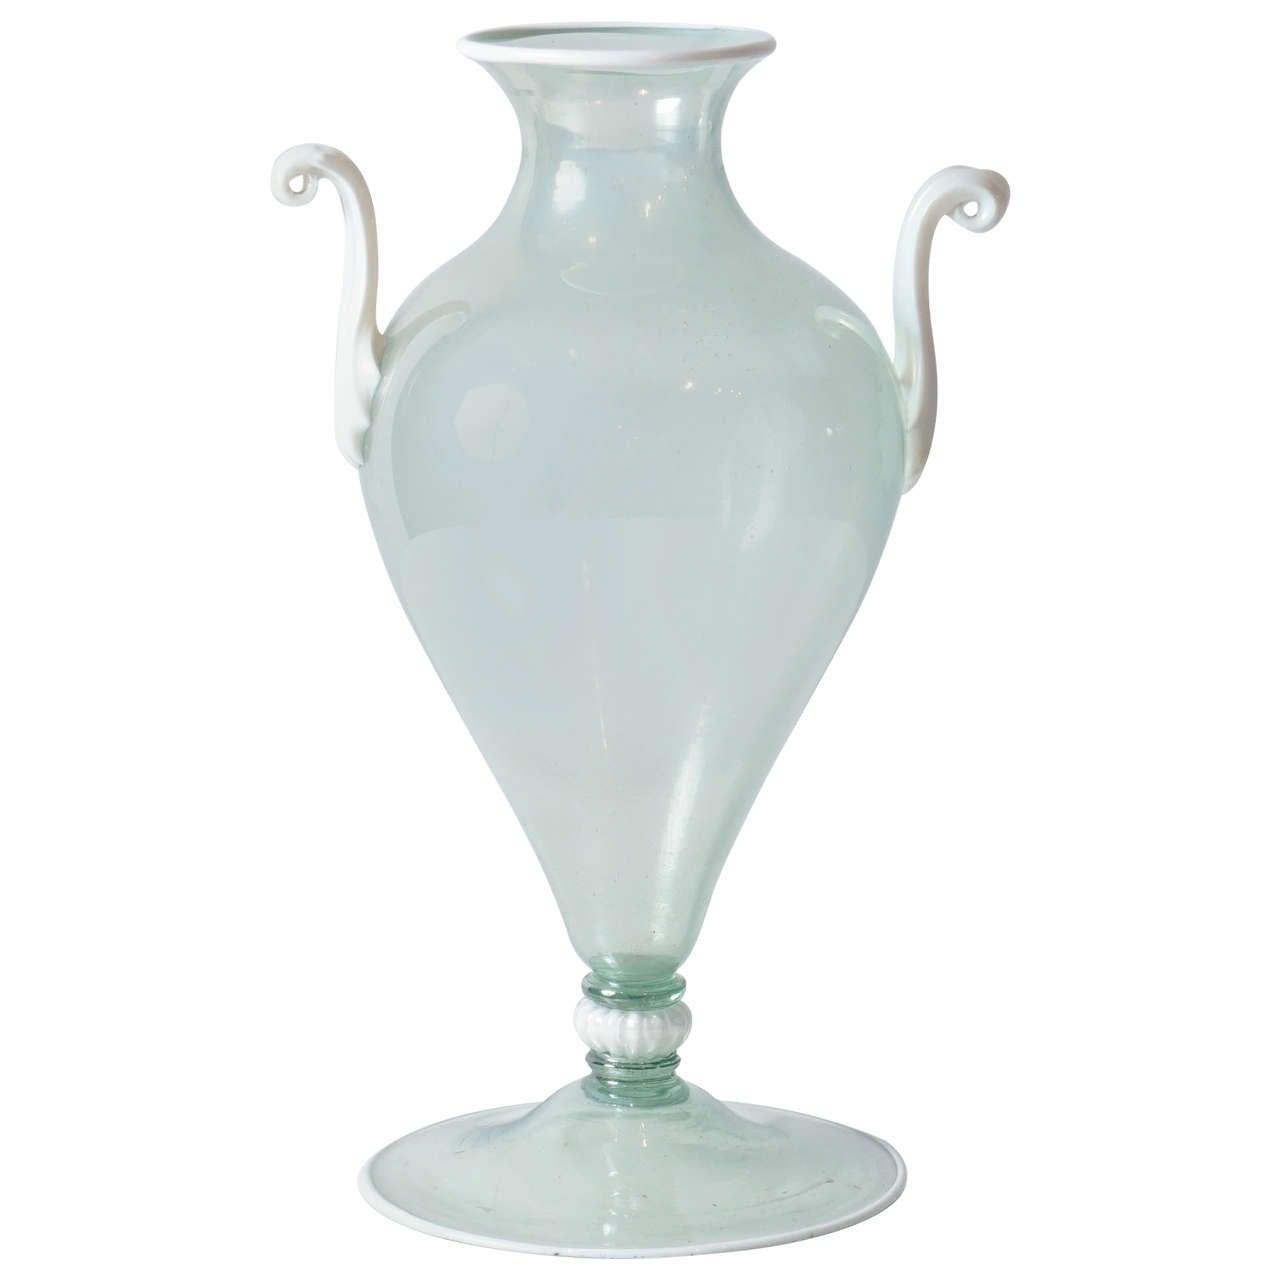 Beautiful Double Handled Pale Blue Murano Vase